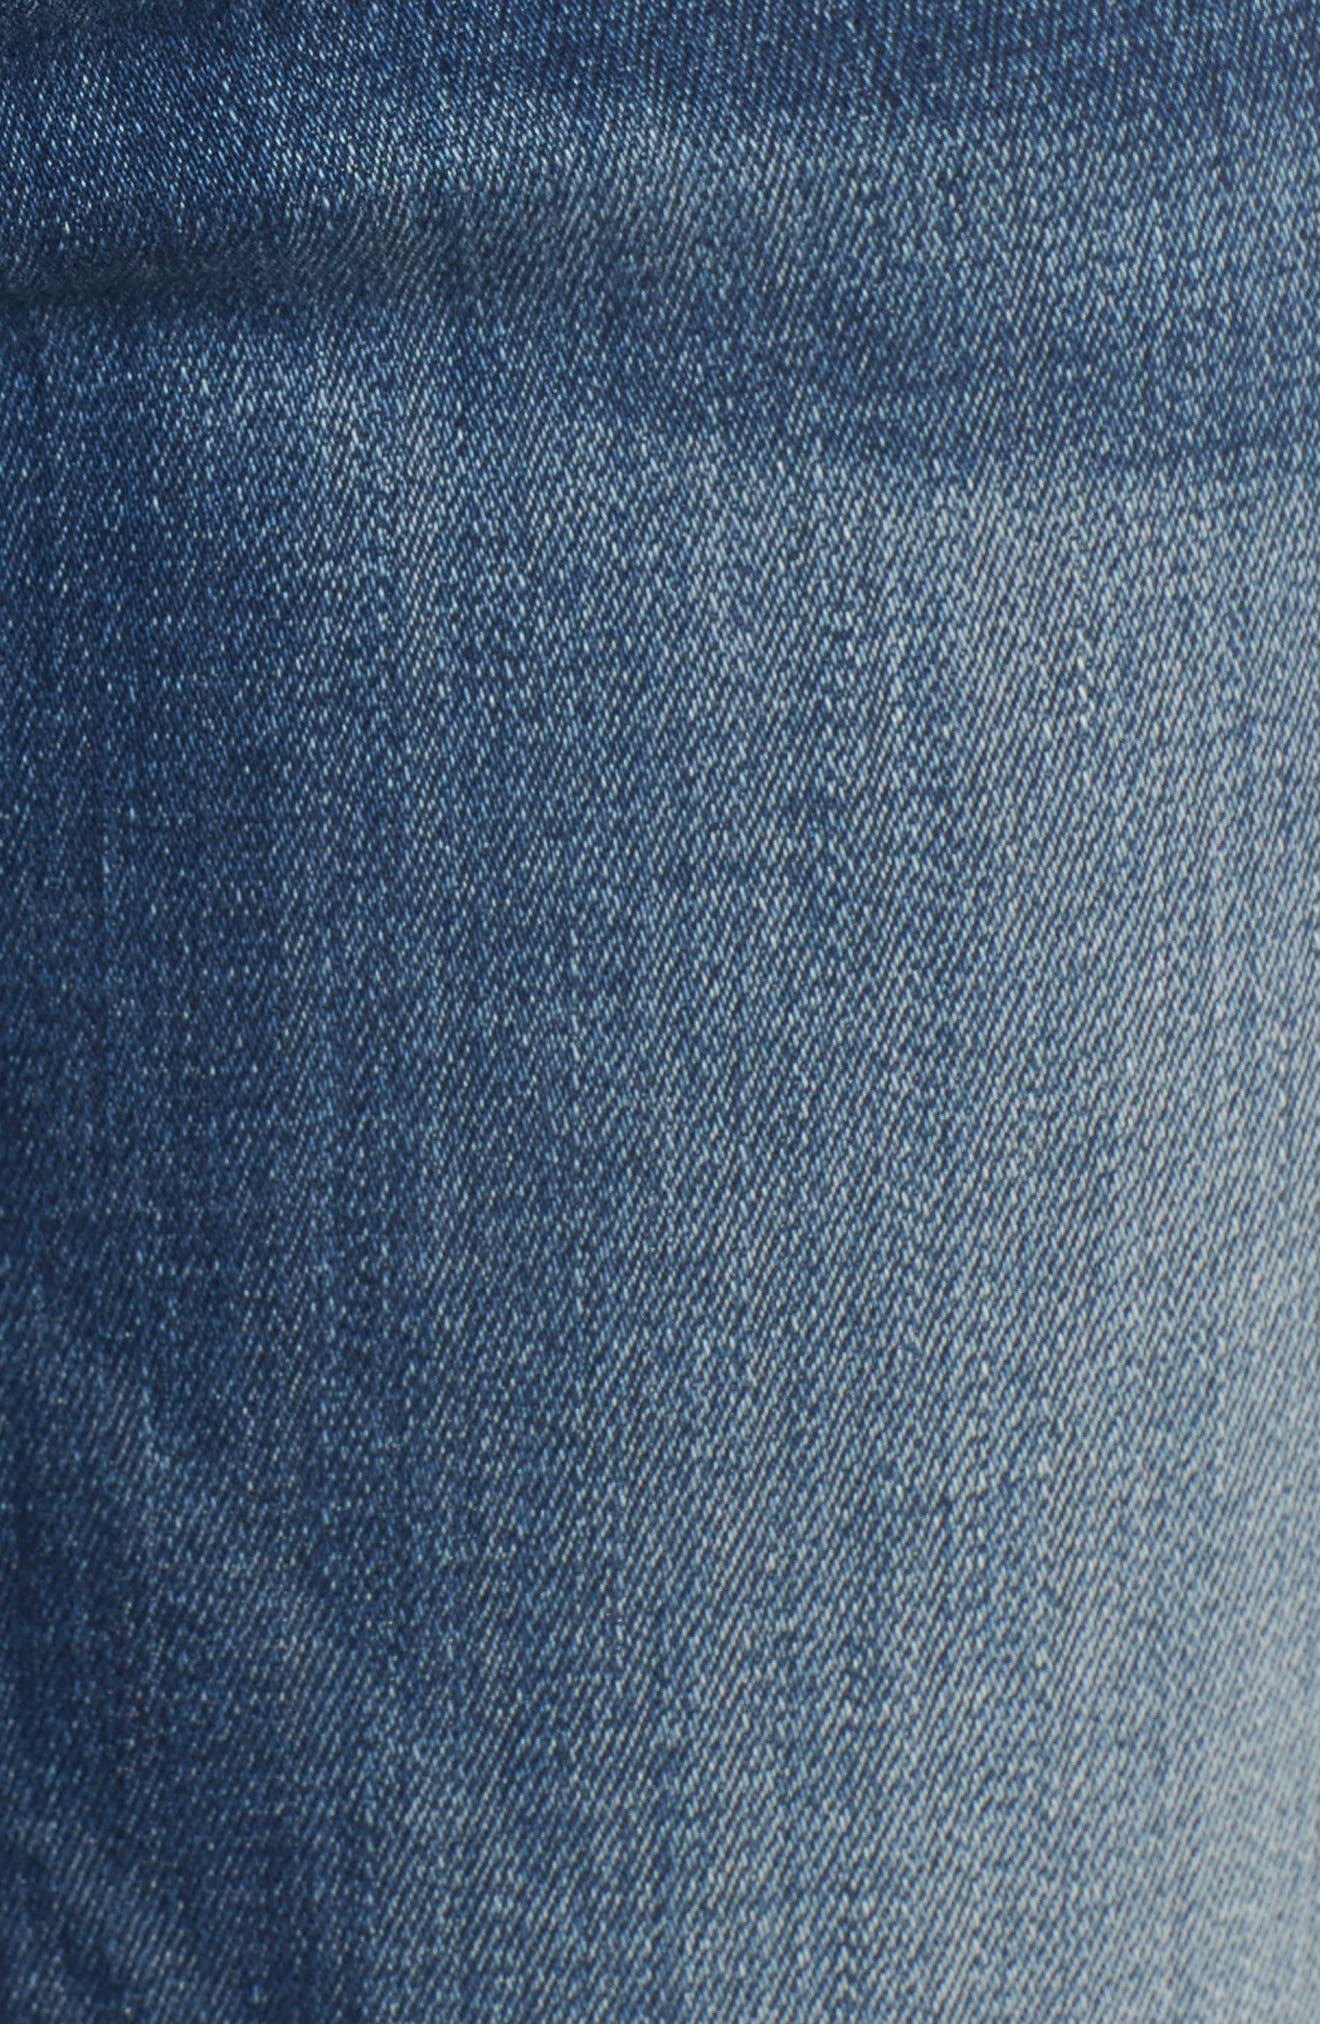 Emma Power Legging Jeans,                             Alternate thumbnail 5, color,                             425